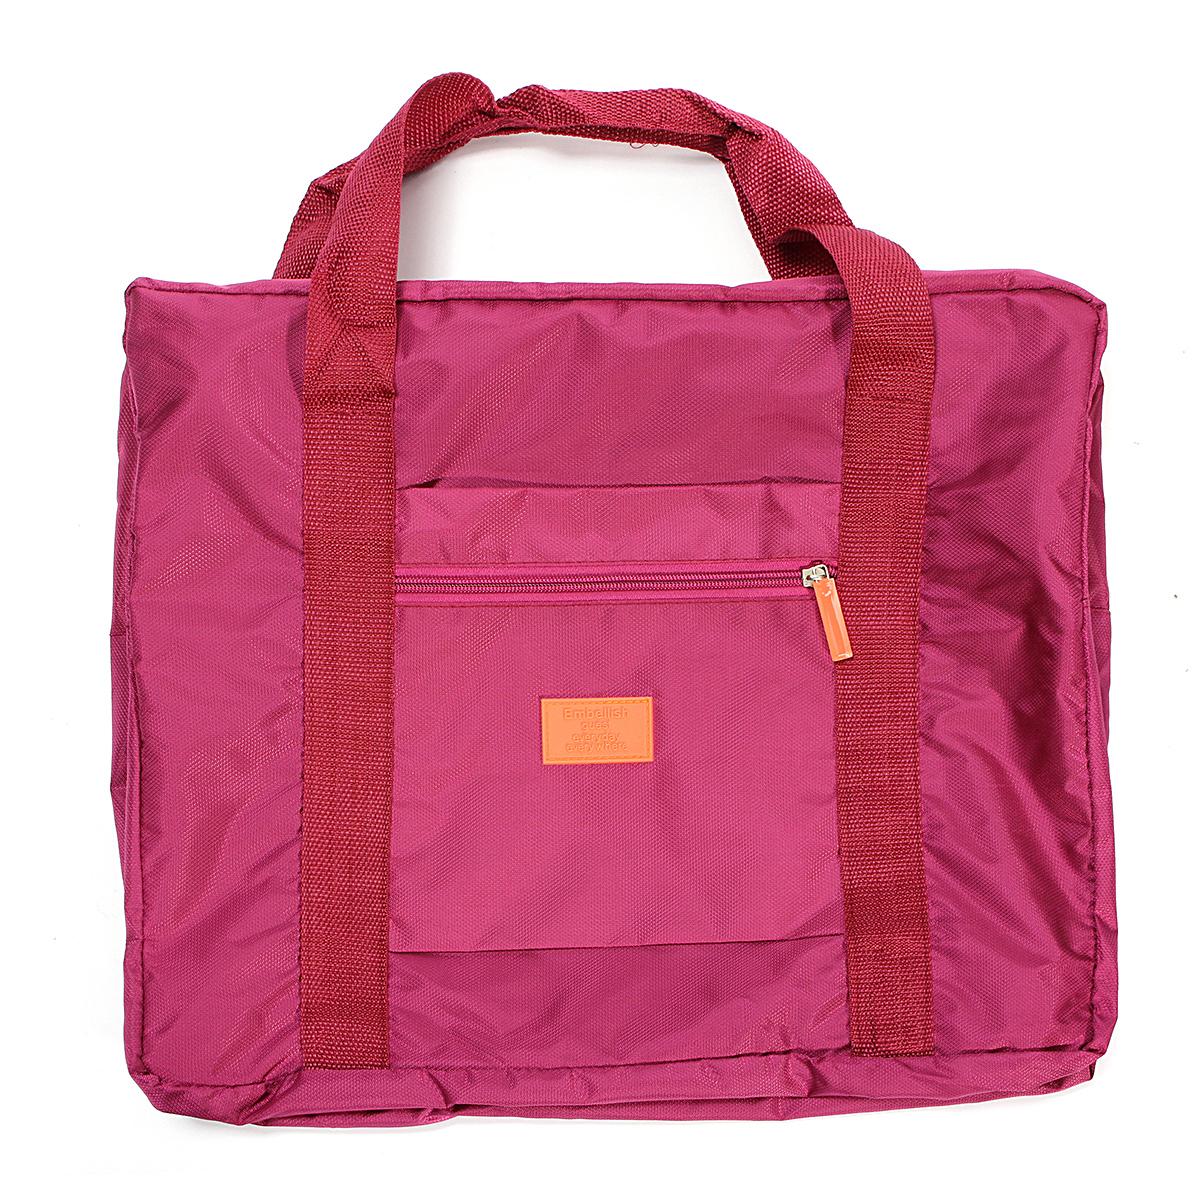 pochette sac cabine bagages v tement rangement main epaule pliable voyage maison ebay. Black Bedroom Furniture Sets. Home Design Ideas